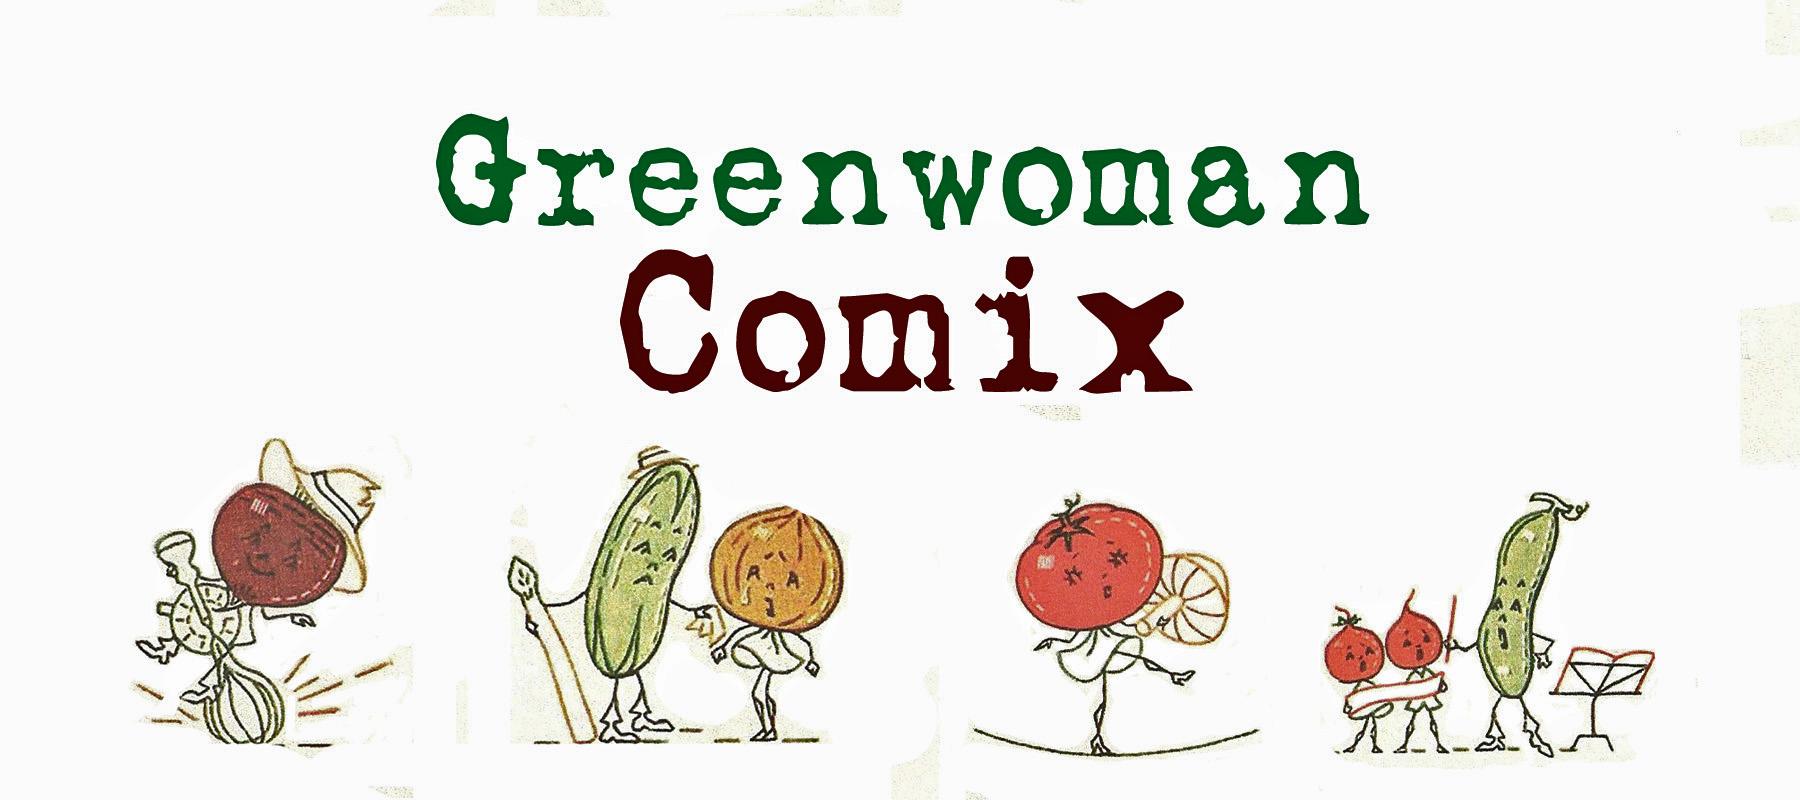 Greenwoman Comix Heading USR_edited-3